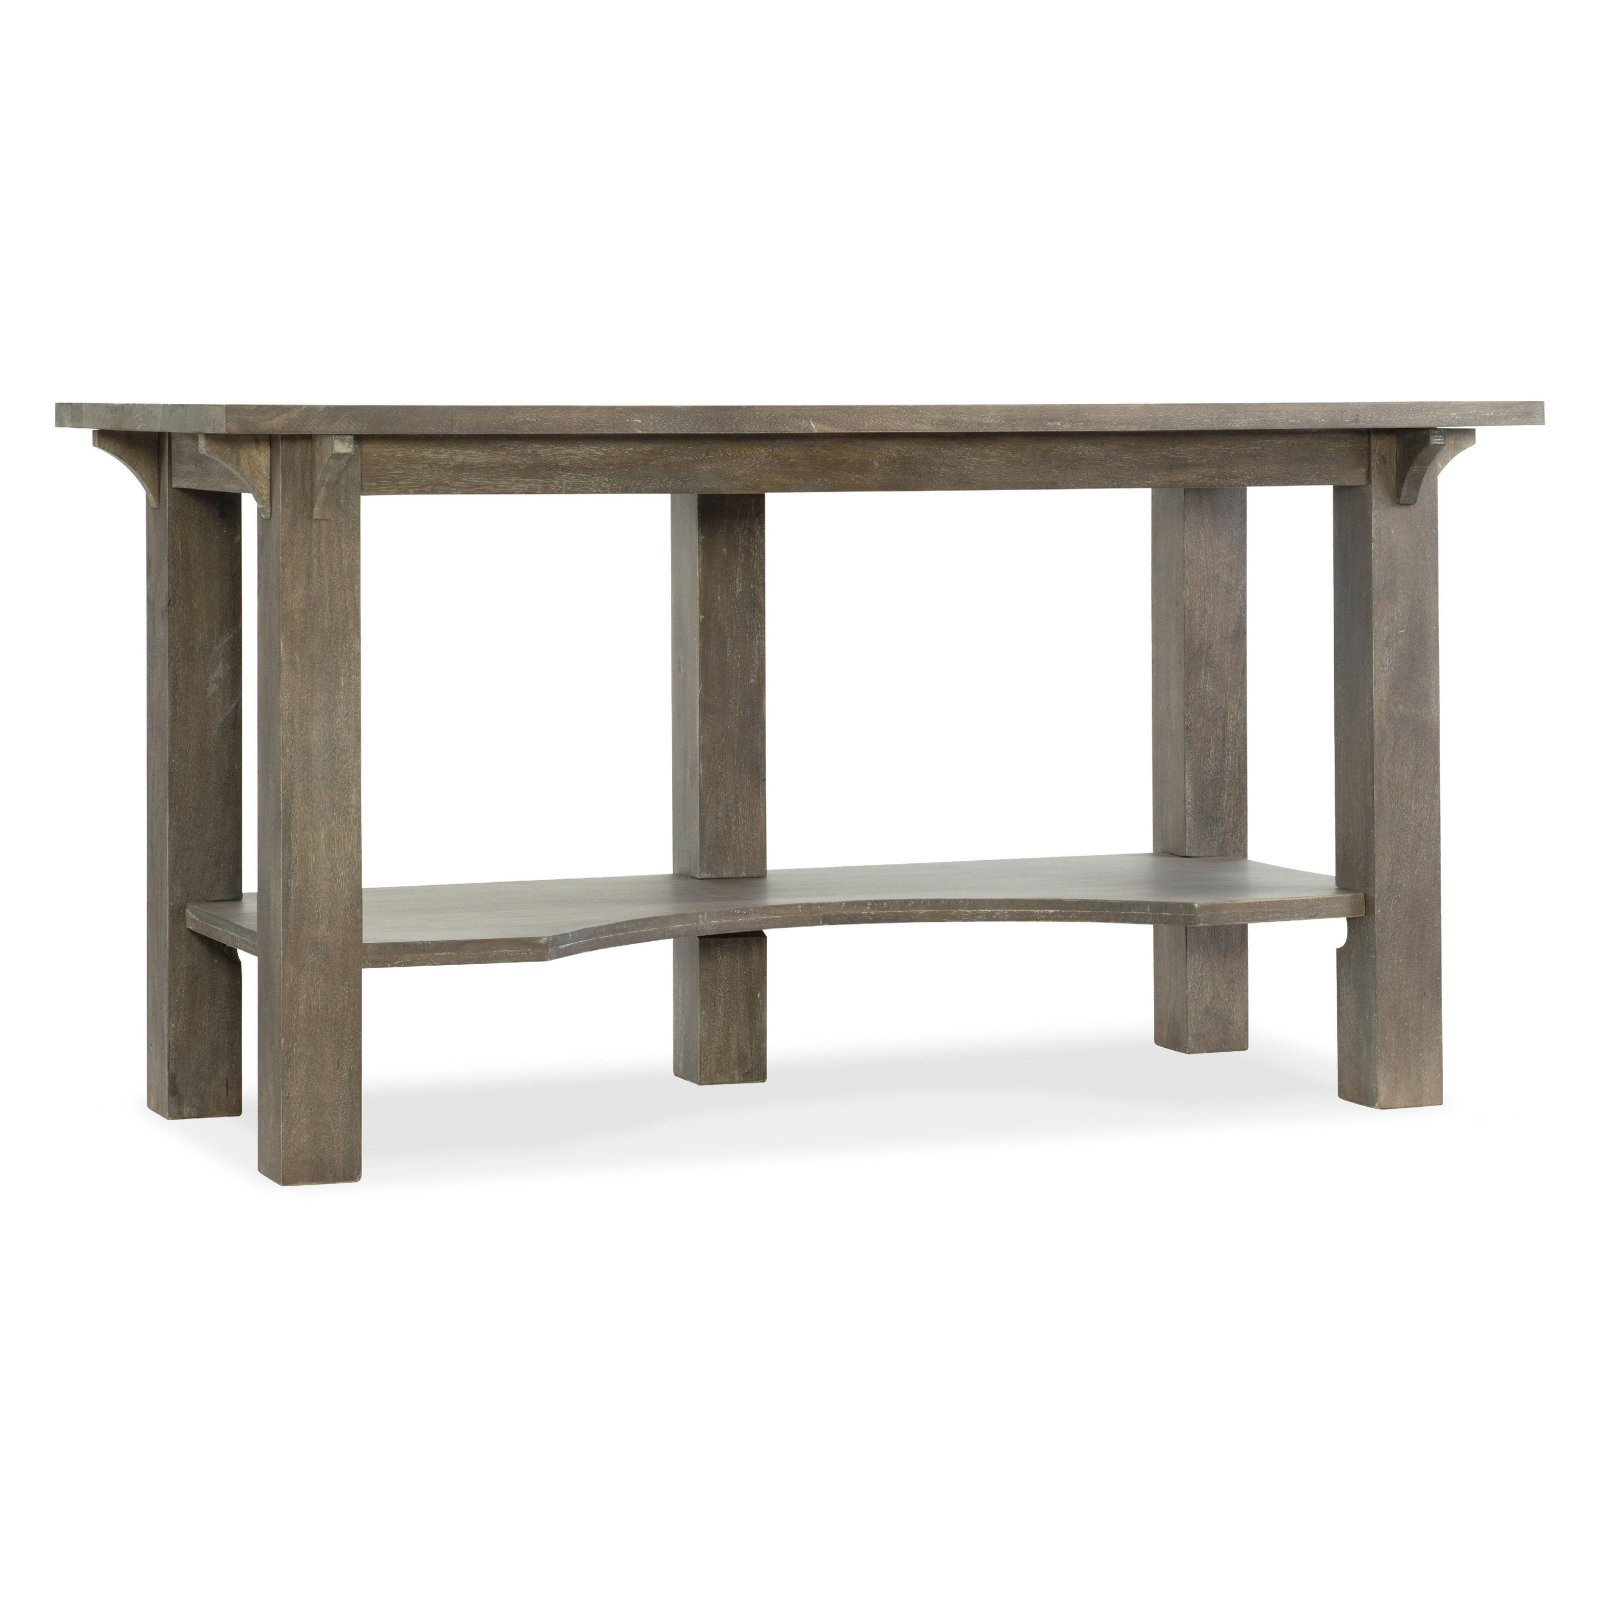 Furniture Urban Farmhouse Work Surface Desk In 2019